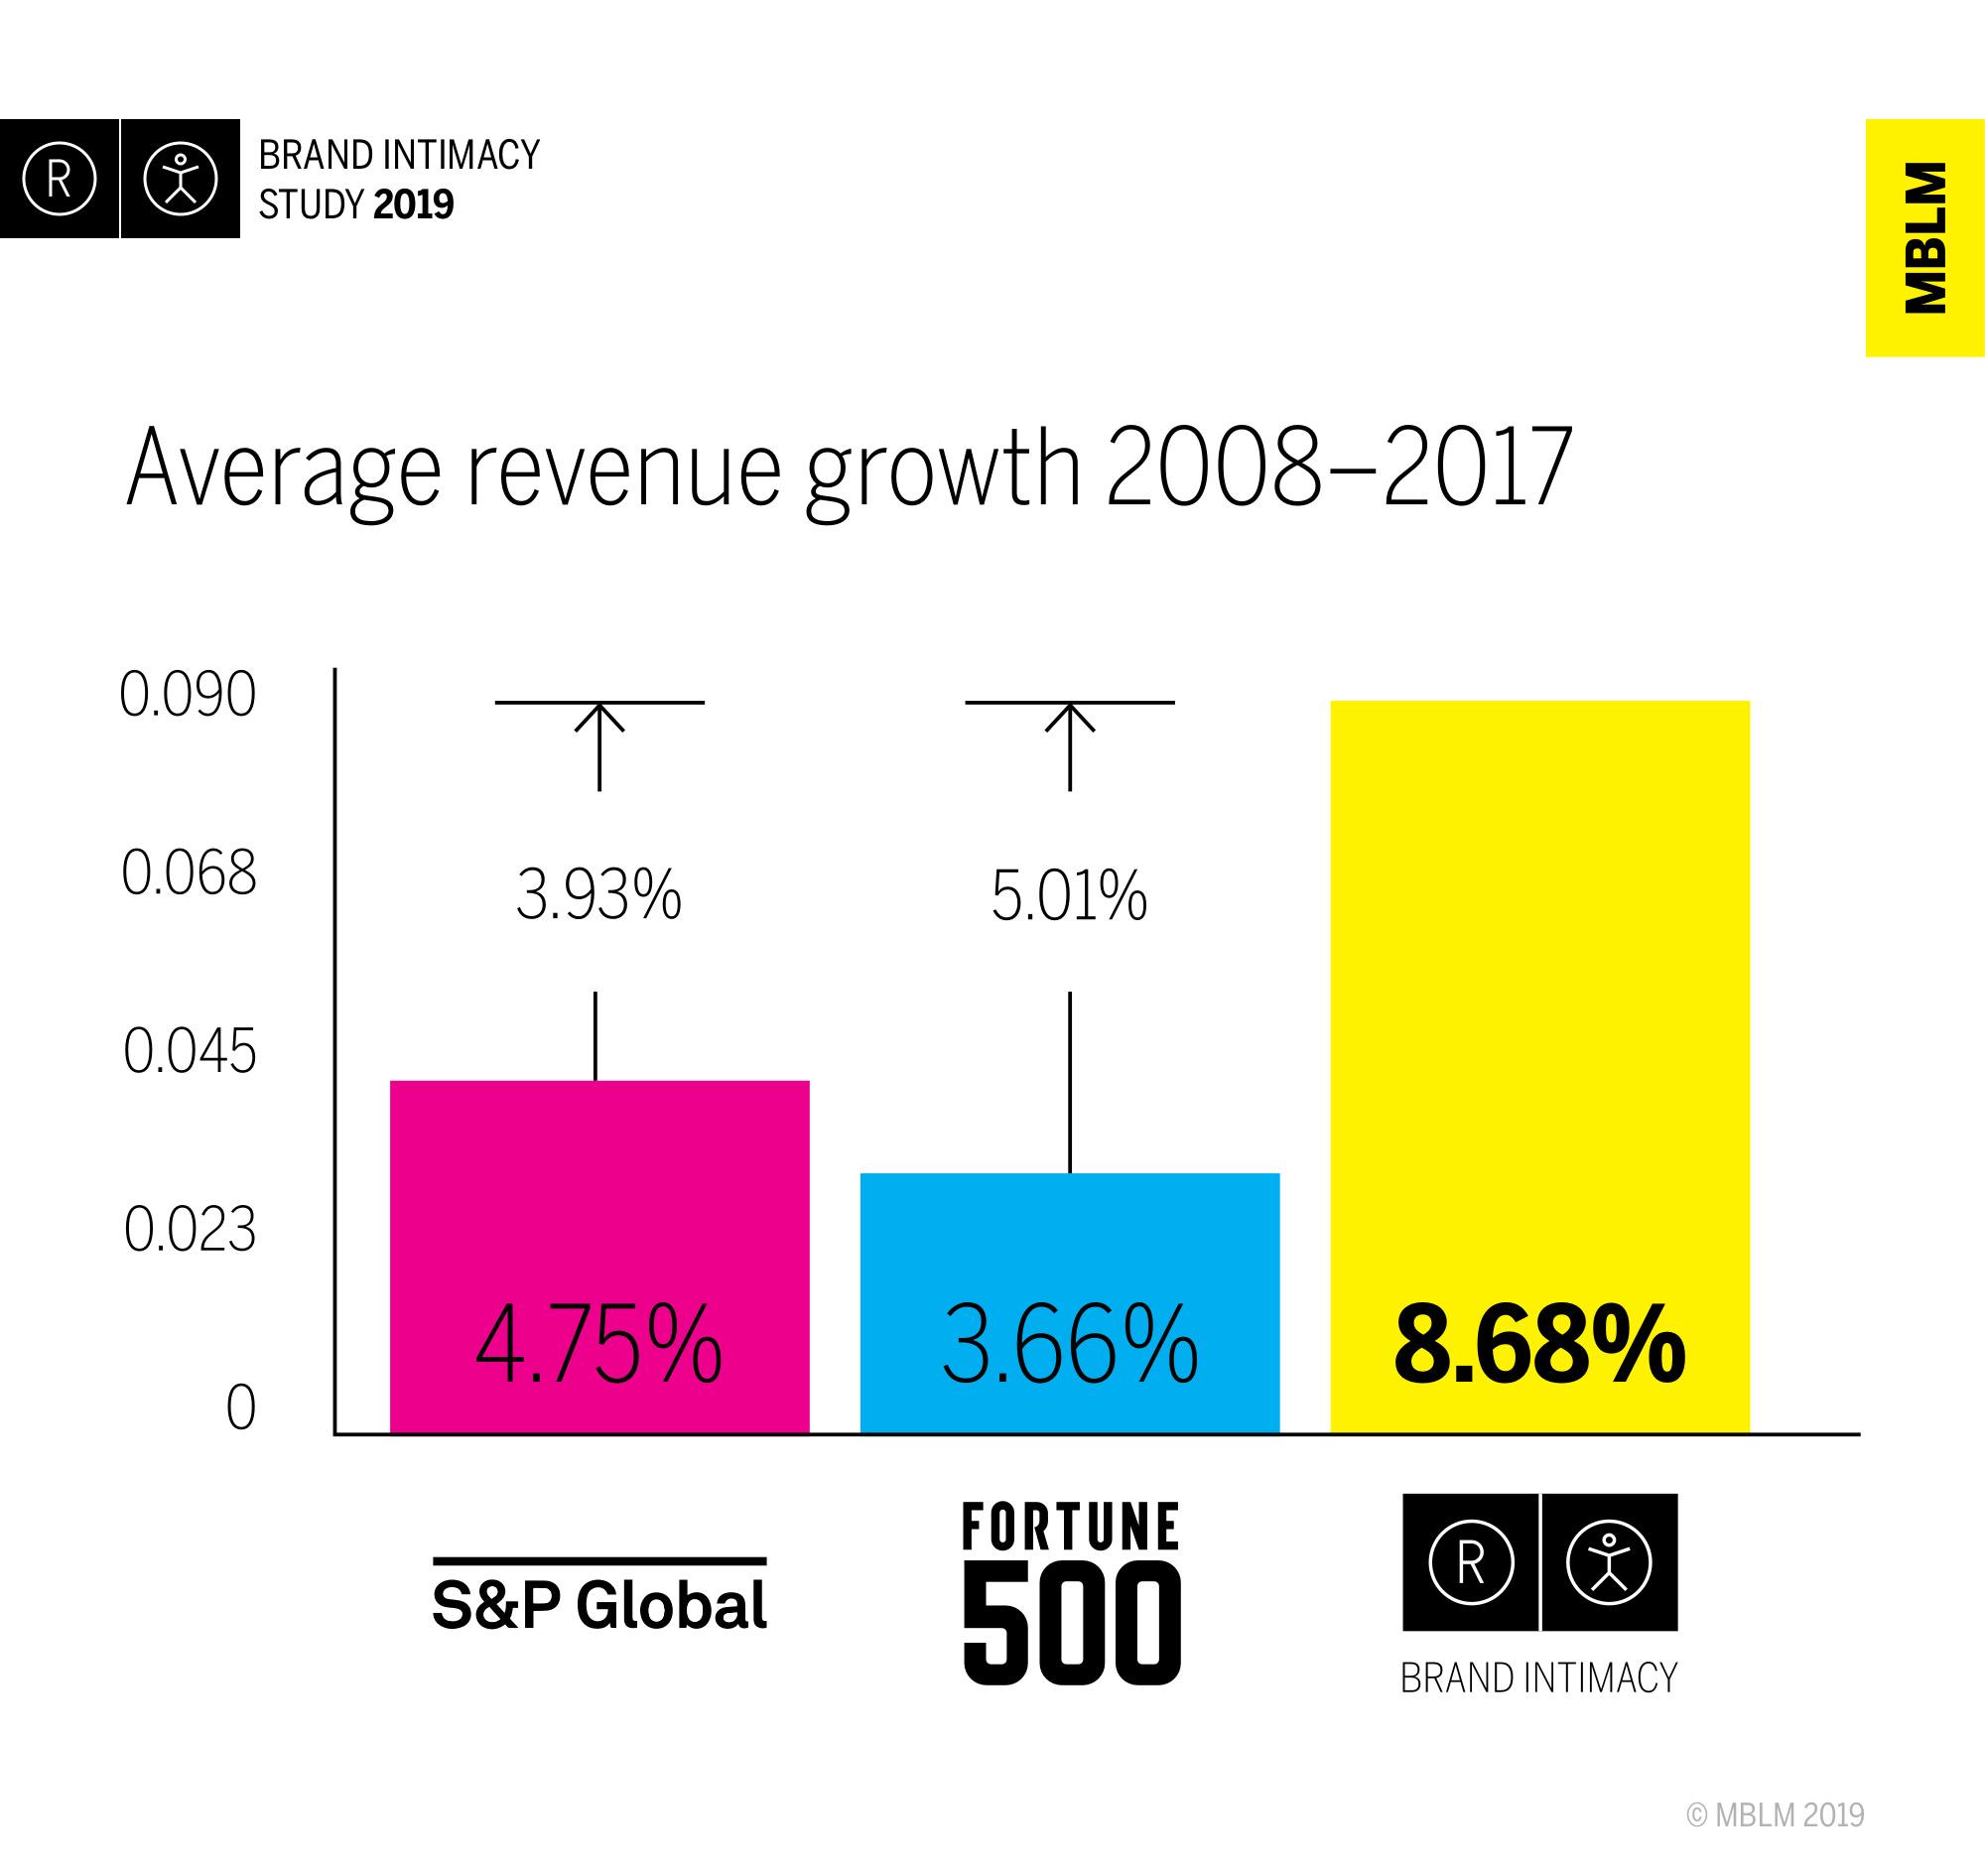 Average Revenue Growth 2008-2017